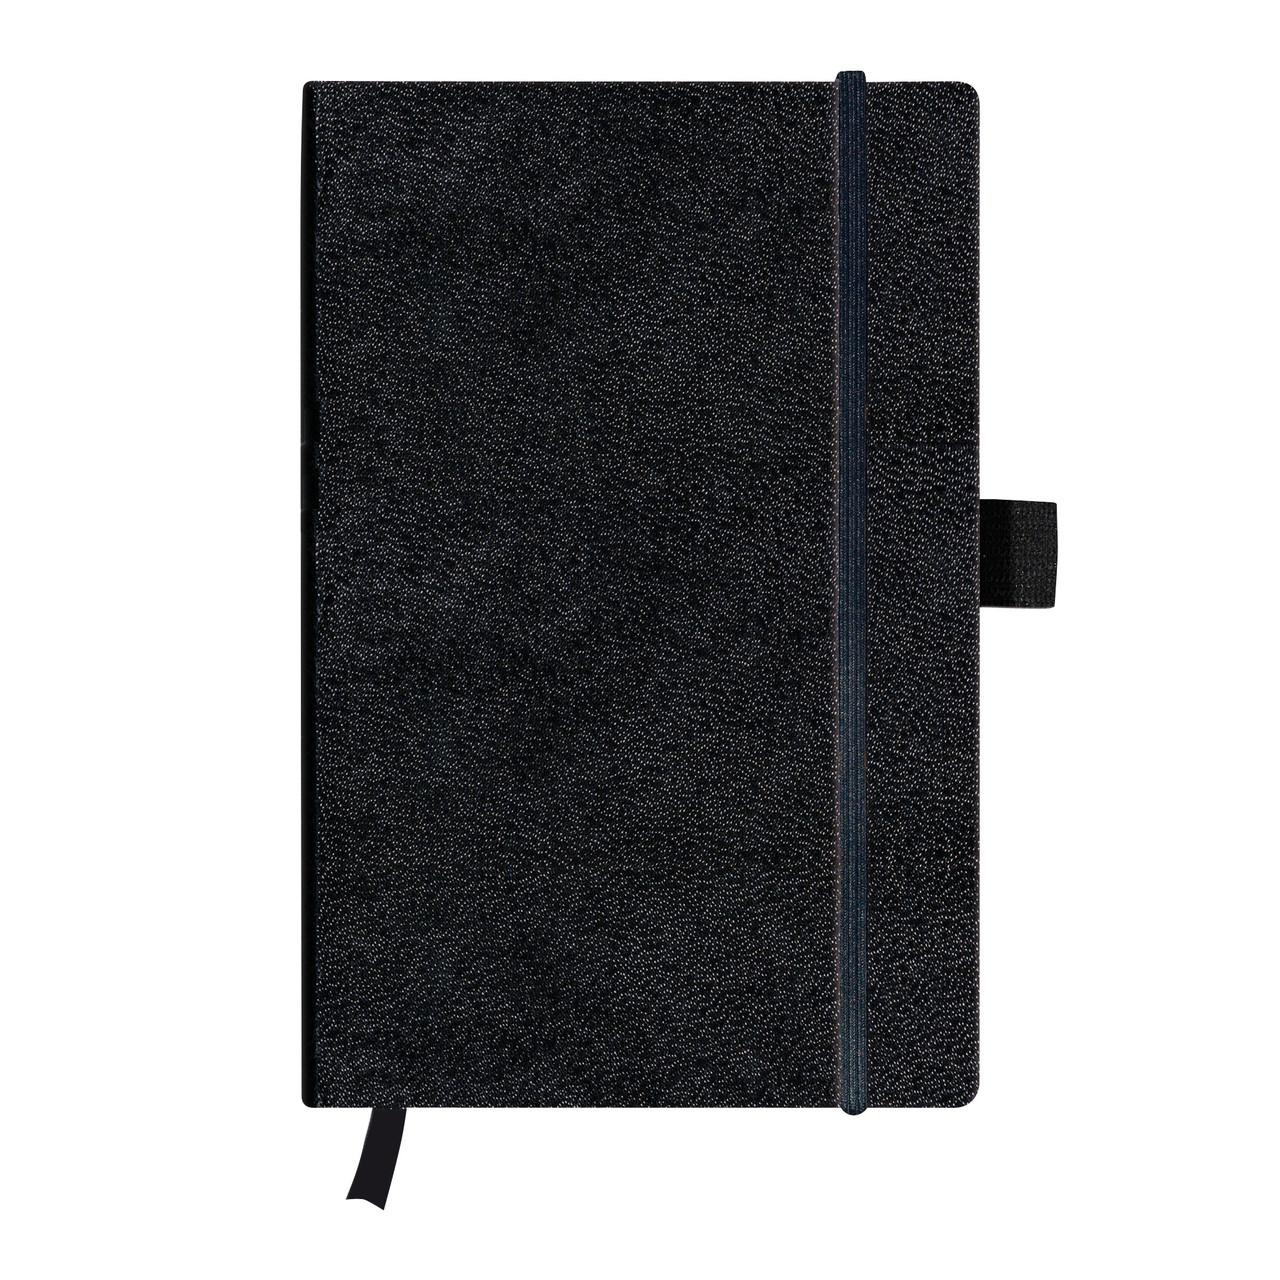 Записная книга Herlitz А5 96л My.Book Classic Black клетка обложка имитация кожи (10789428)